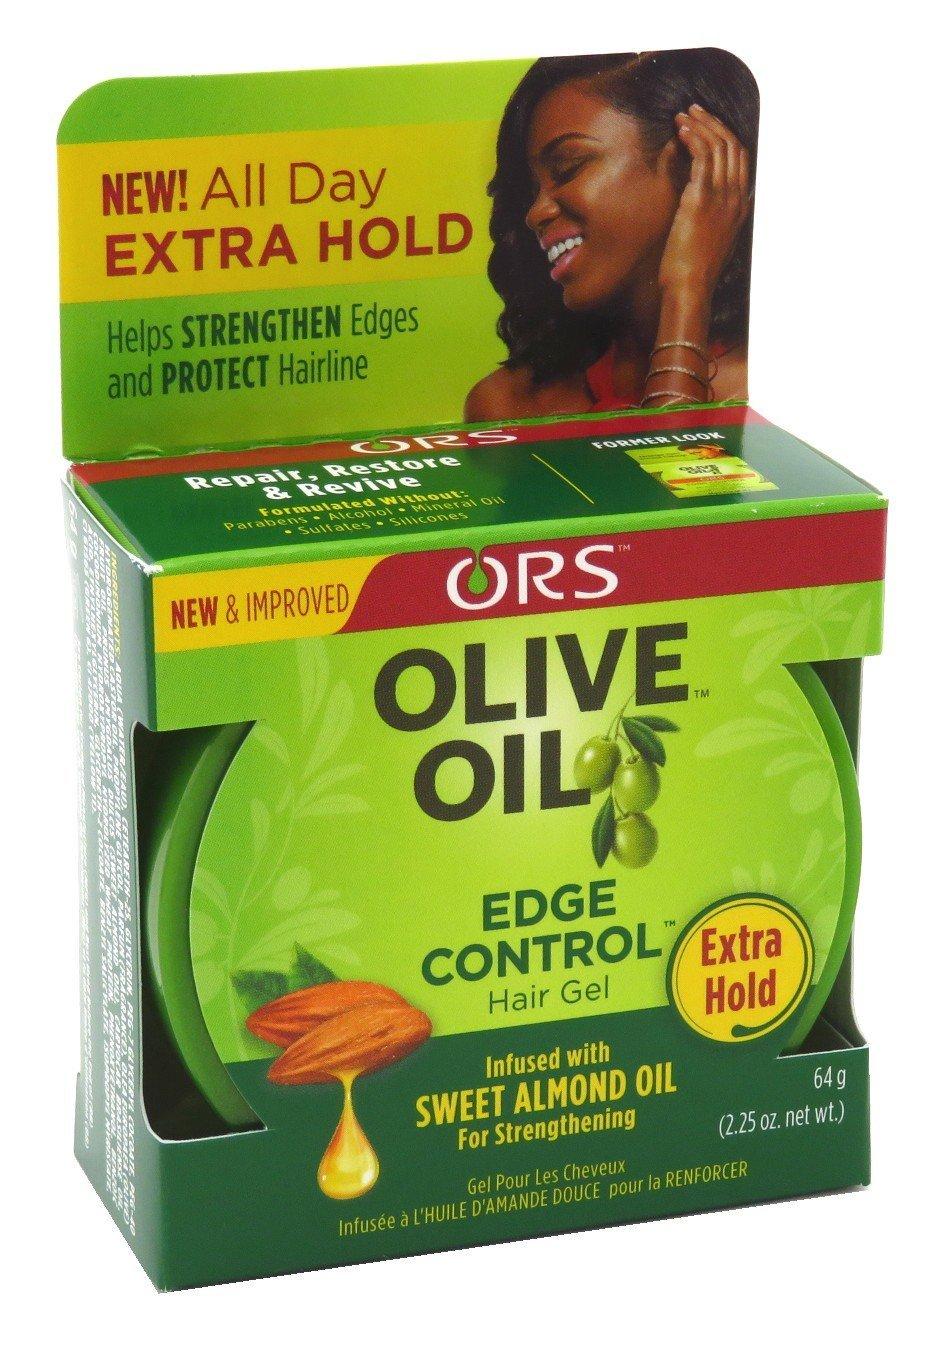 Organic R/s Root Stimulator Olive Oil Edge Control Hair Gel, 2.25 Ounce